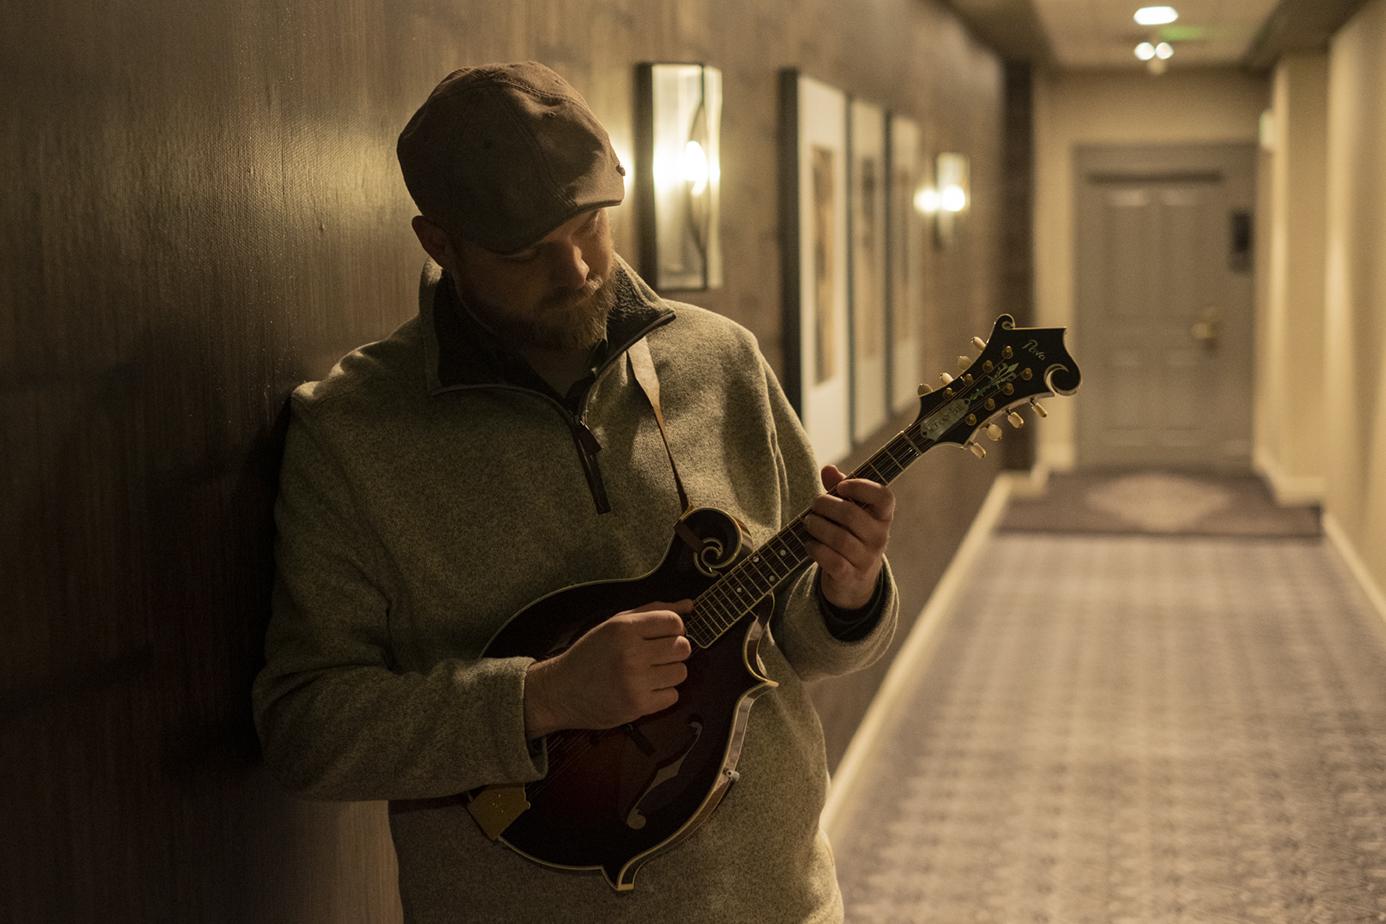 Nate Lee with mandolin in hallway - photo credit Scott Simontacchi